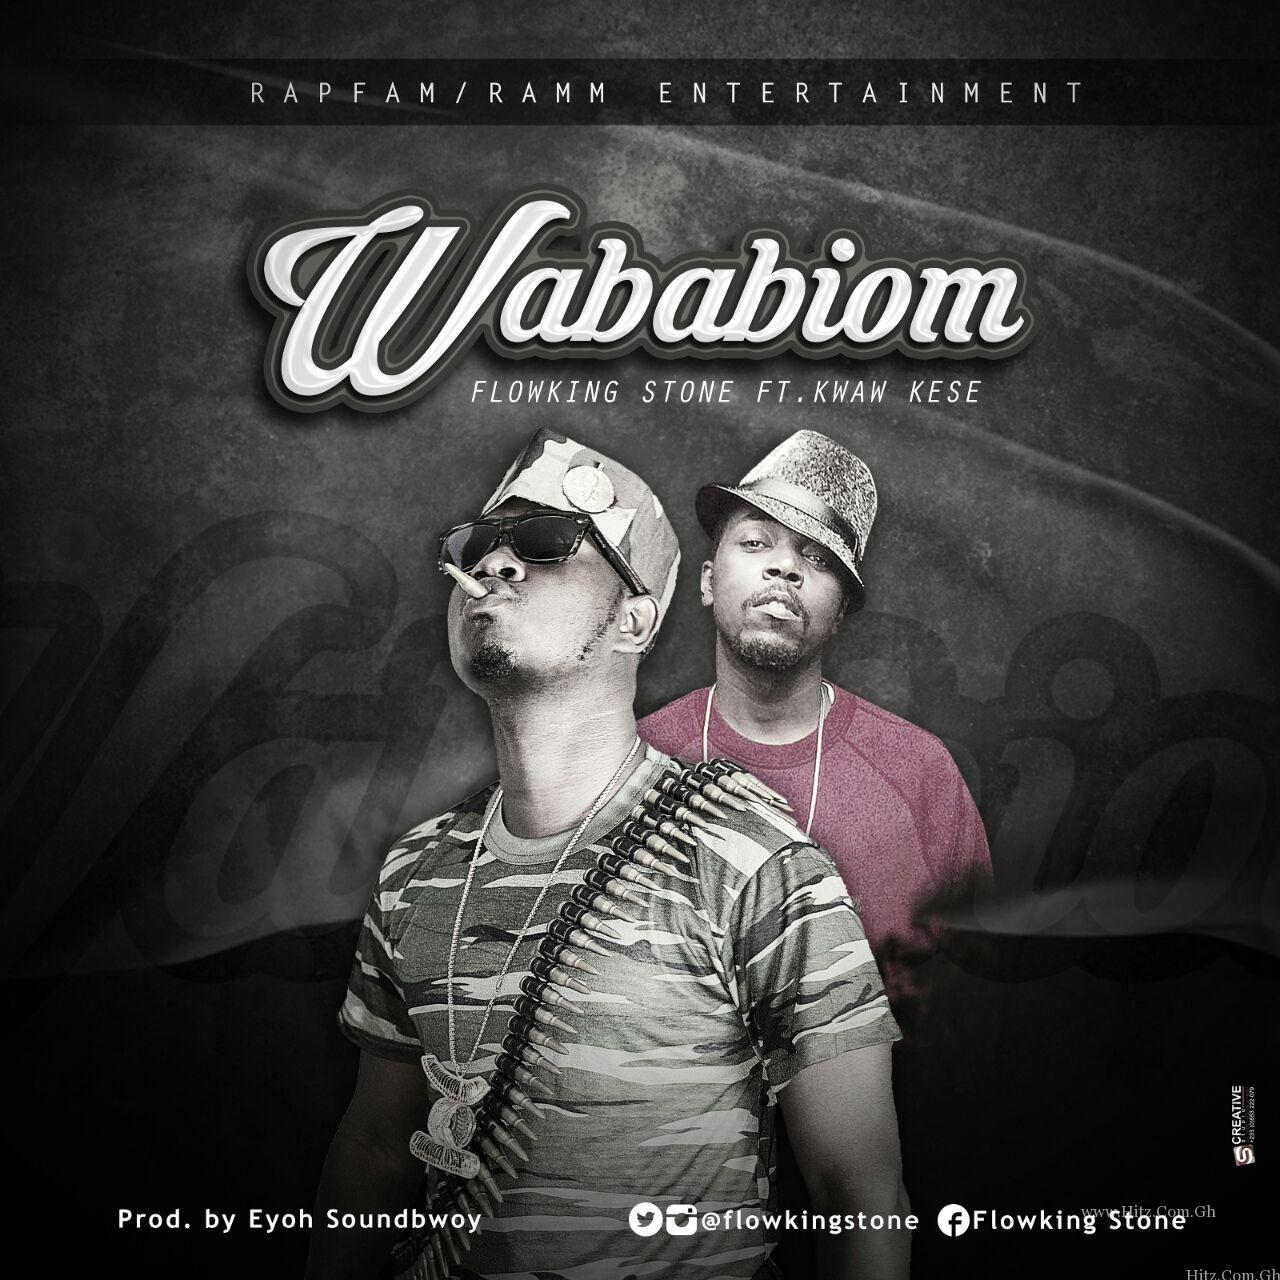 Flowking Stone Wababiom Feat